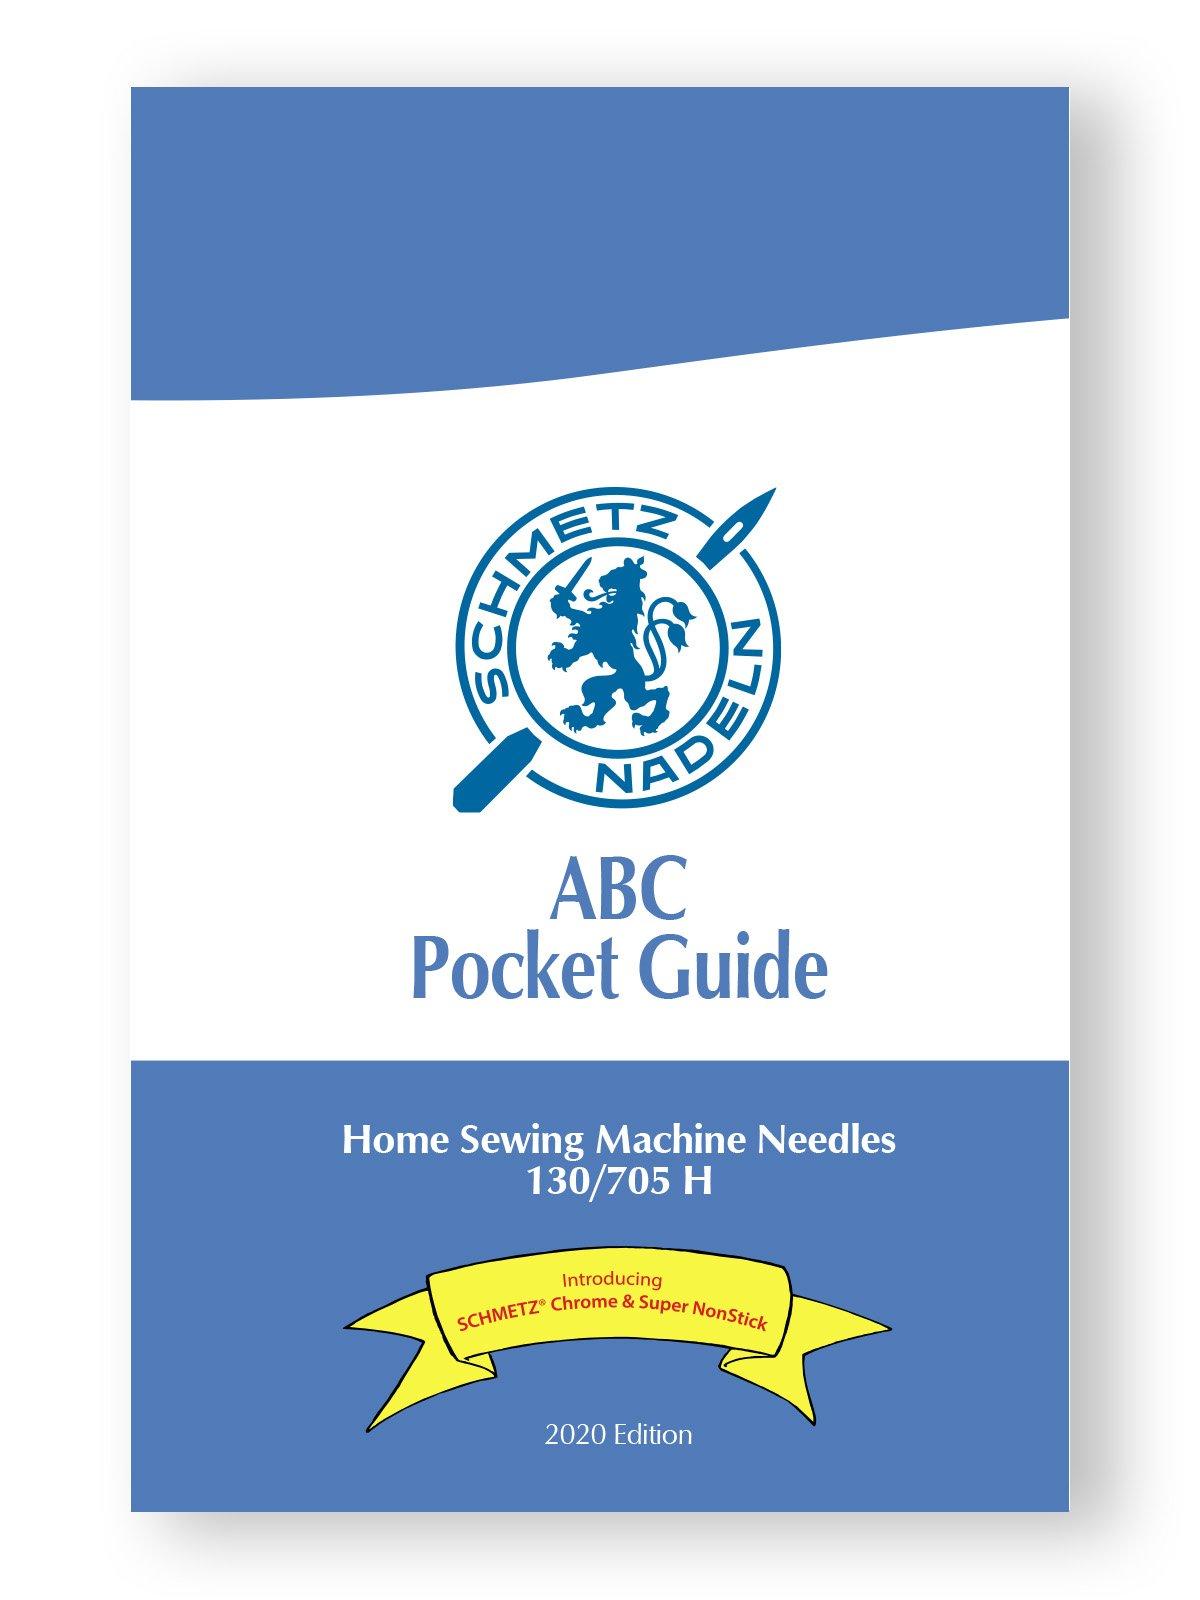 Schmetz Needle ABC Pocket Guide